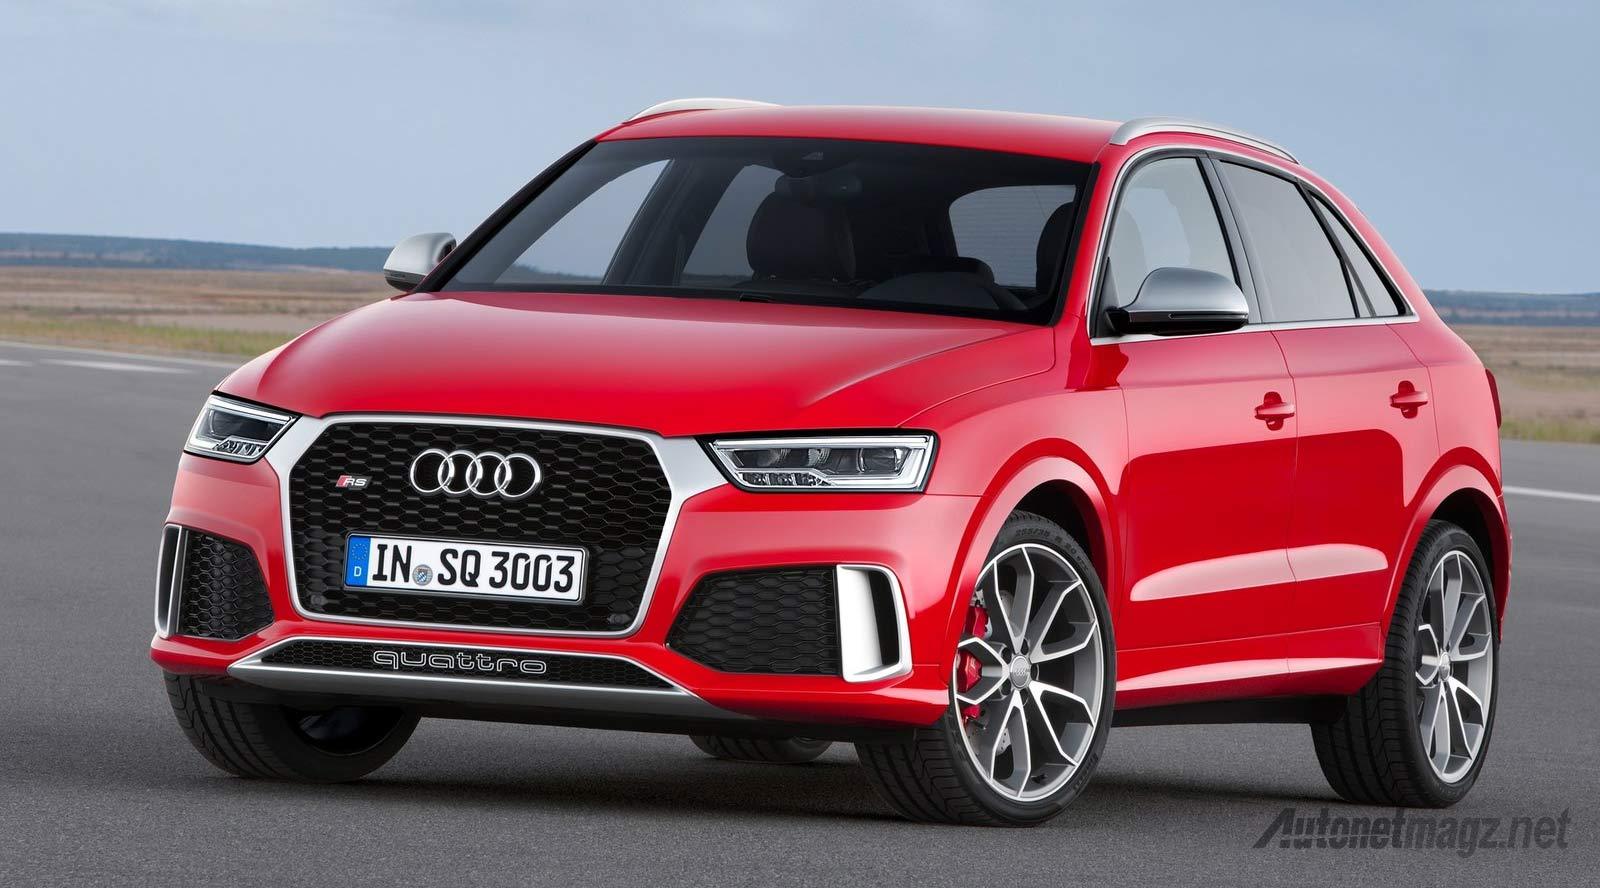 Audi-RS-Q3-Facelift-2015